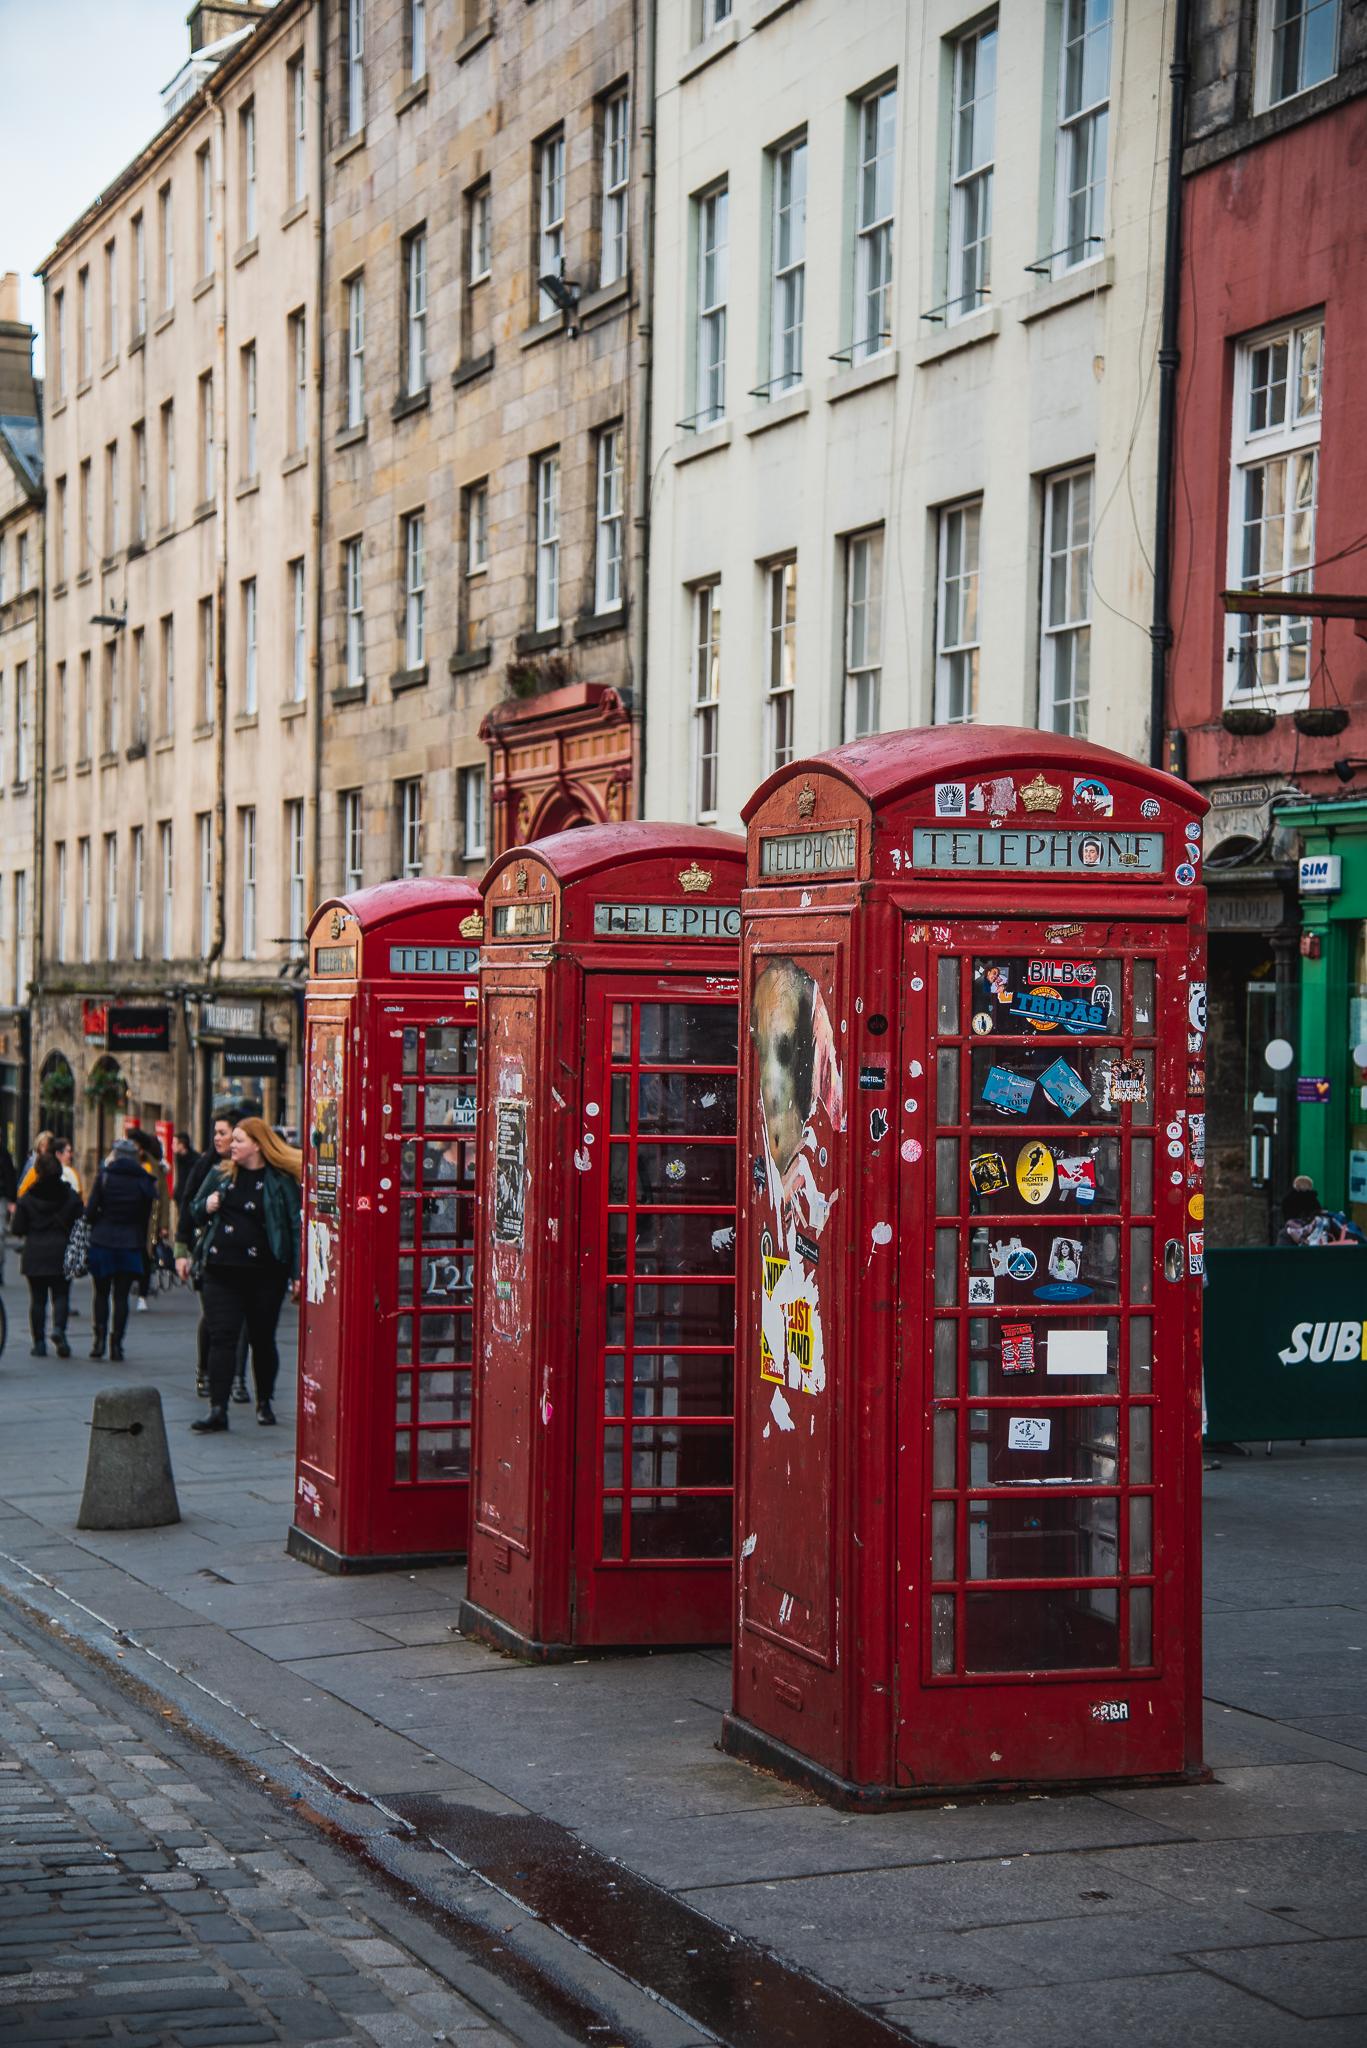 scotland, uk, united kingdom